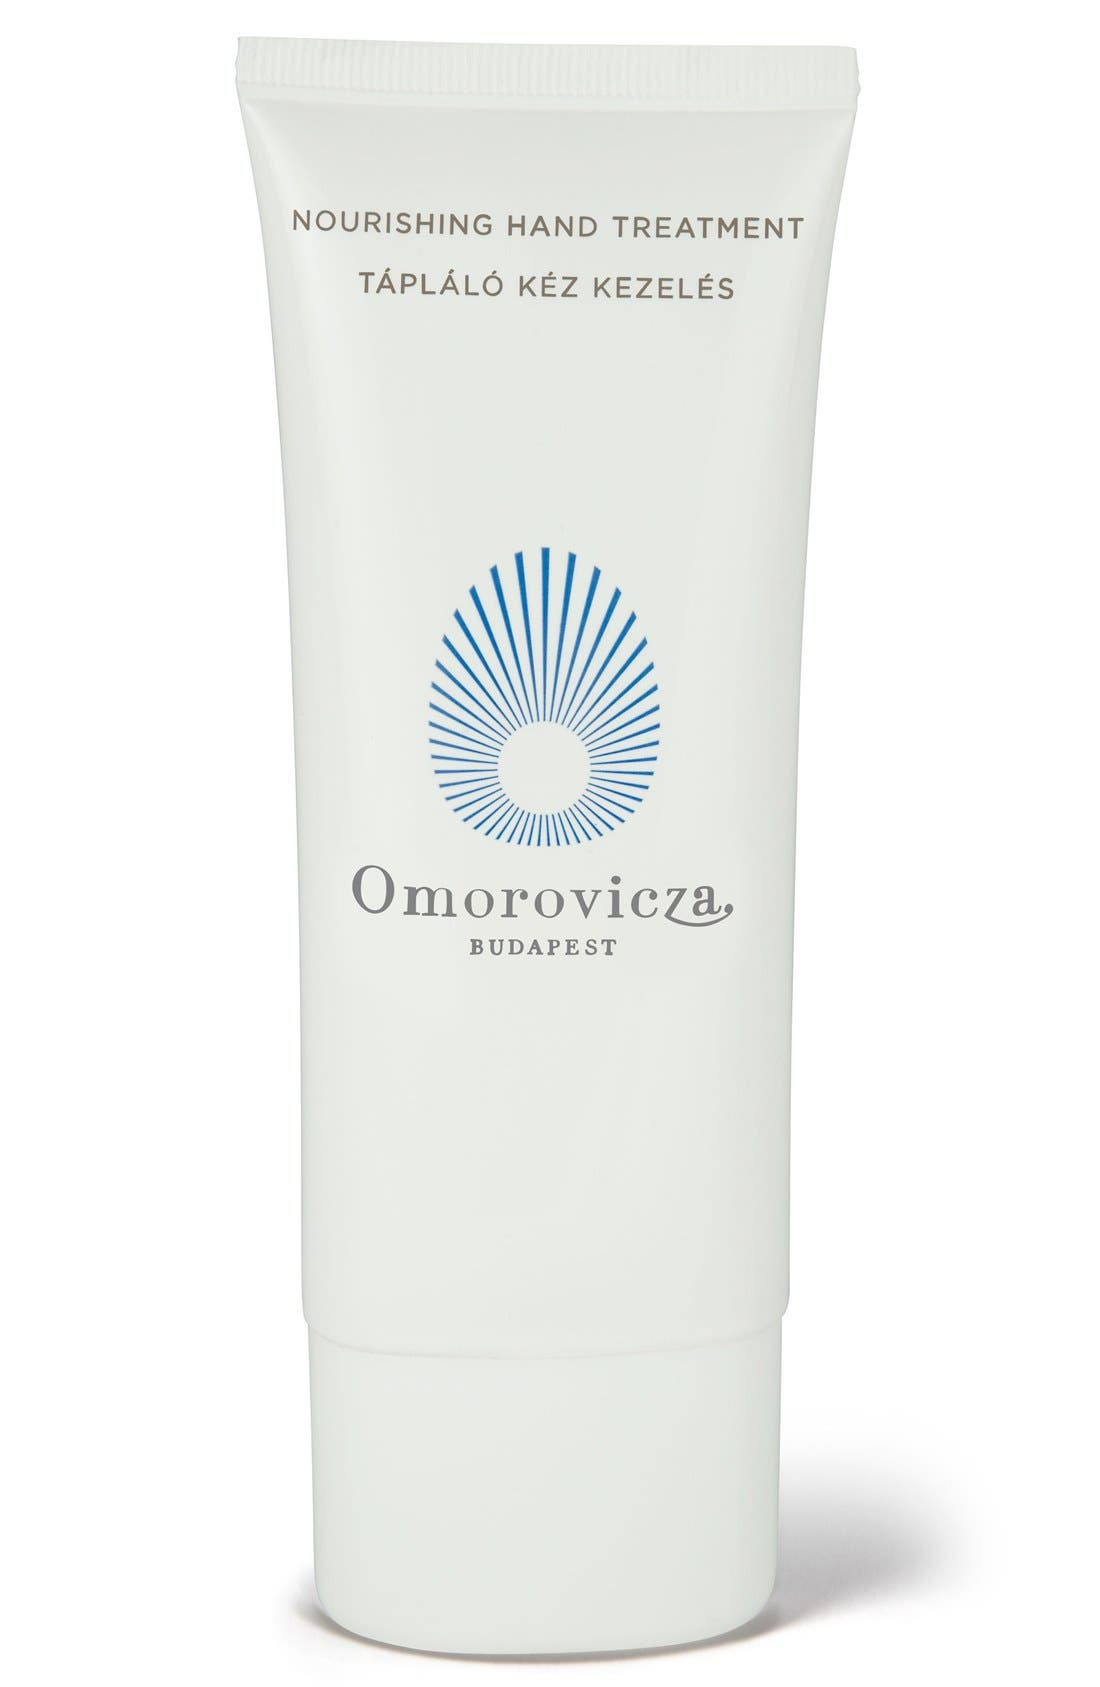 Omorovicza Nourishing Hand Treatment